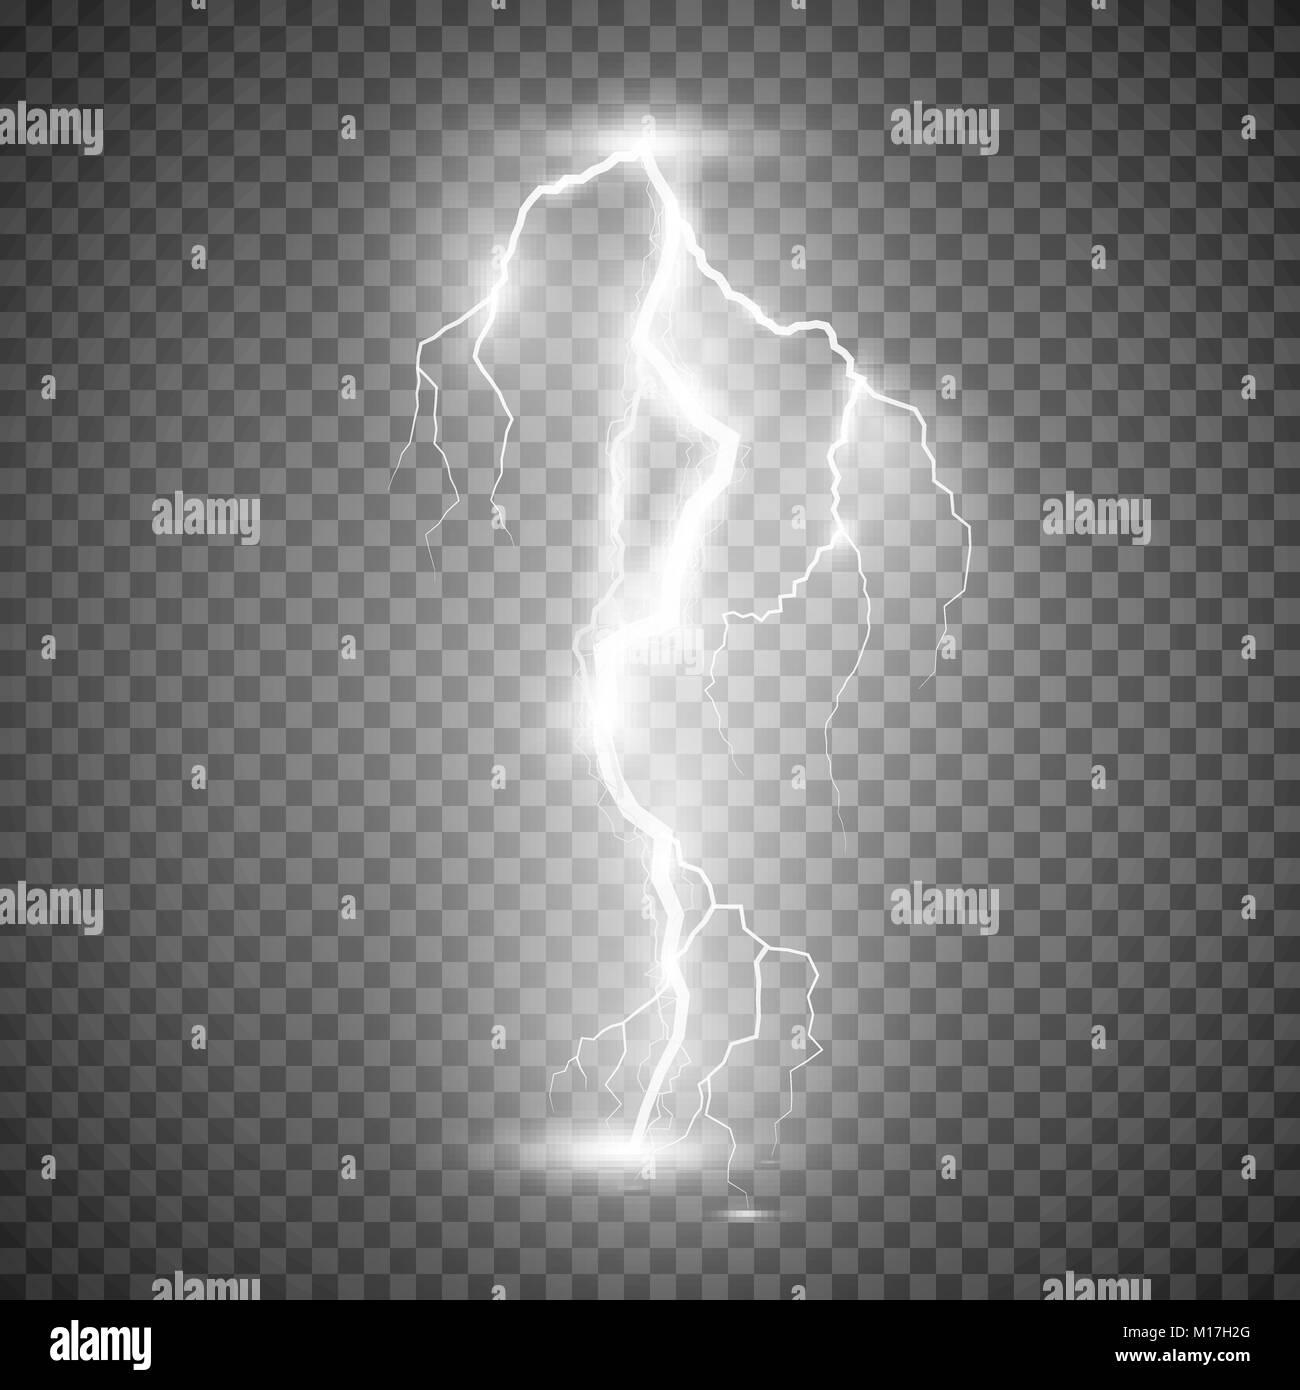 Storm Lightning Bolt Vector Illustration Isolated On Transparent Background